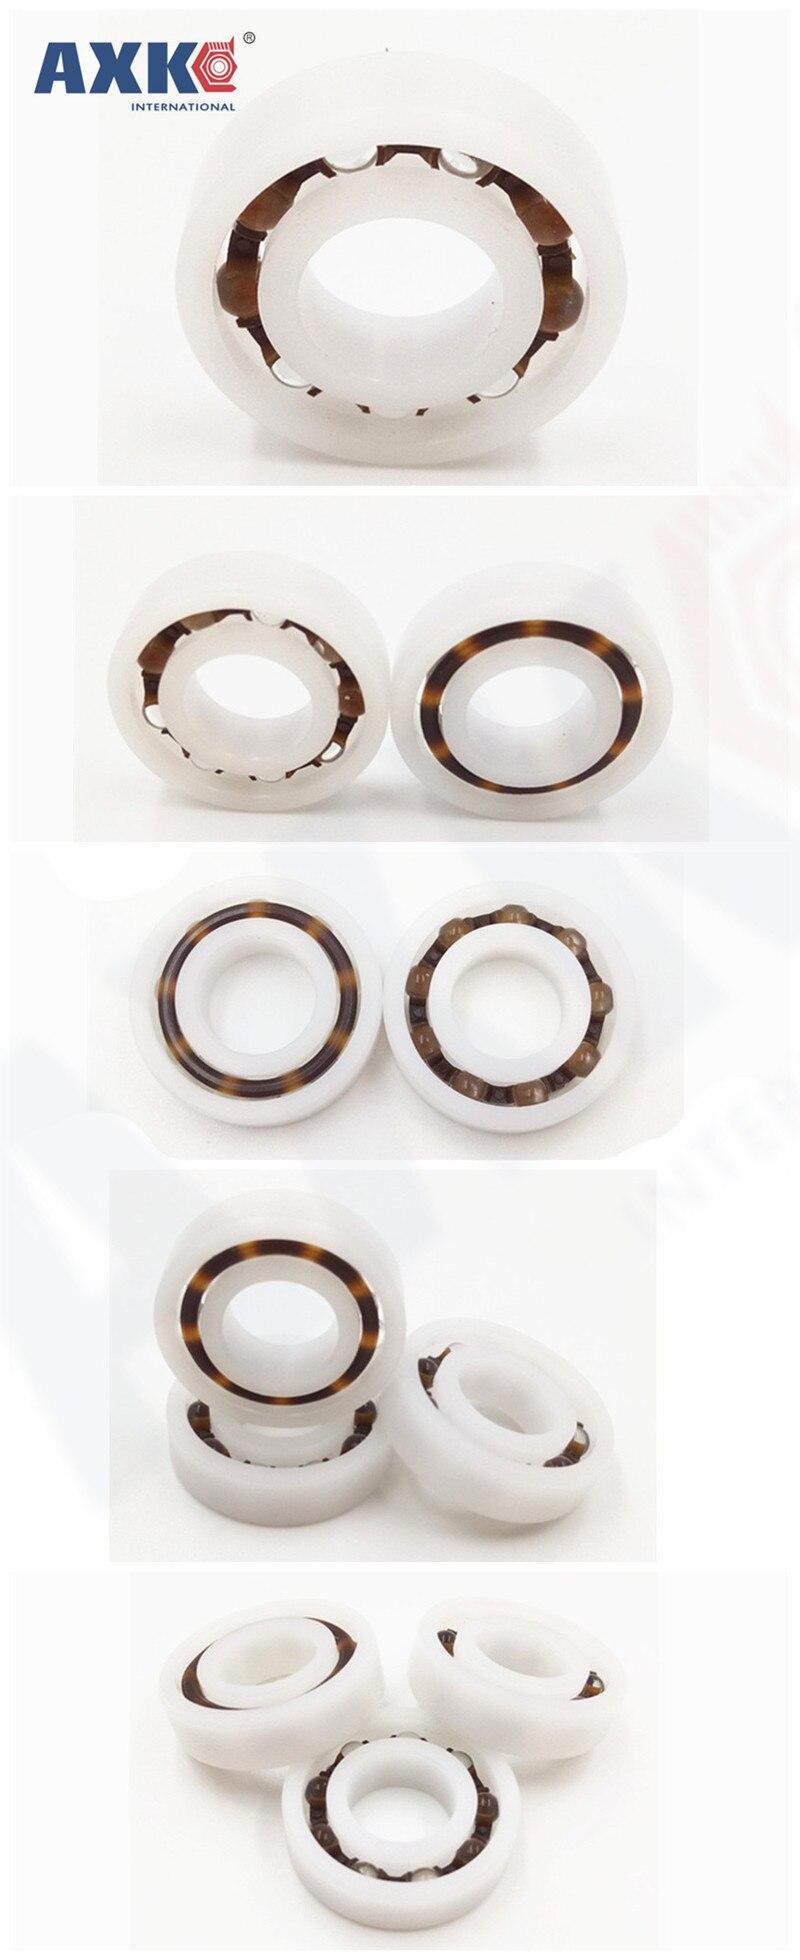 10 PCS Plastic Bearing POM 625 Glass Balls 5x16x5 Ball Bearings